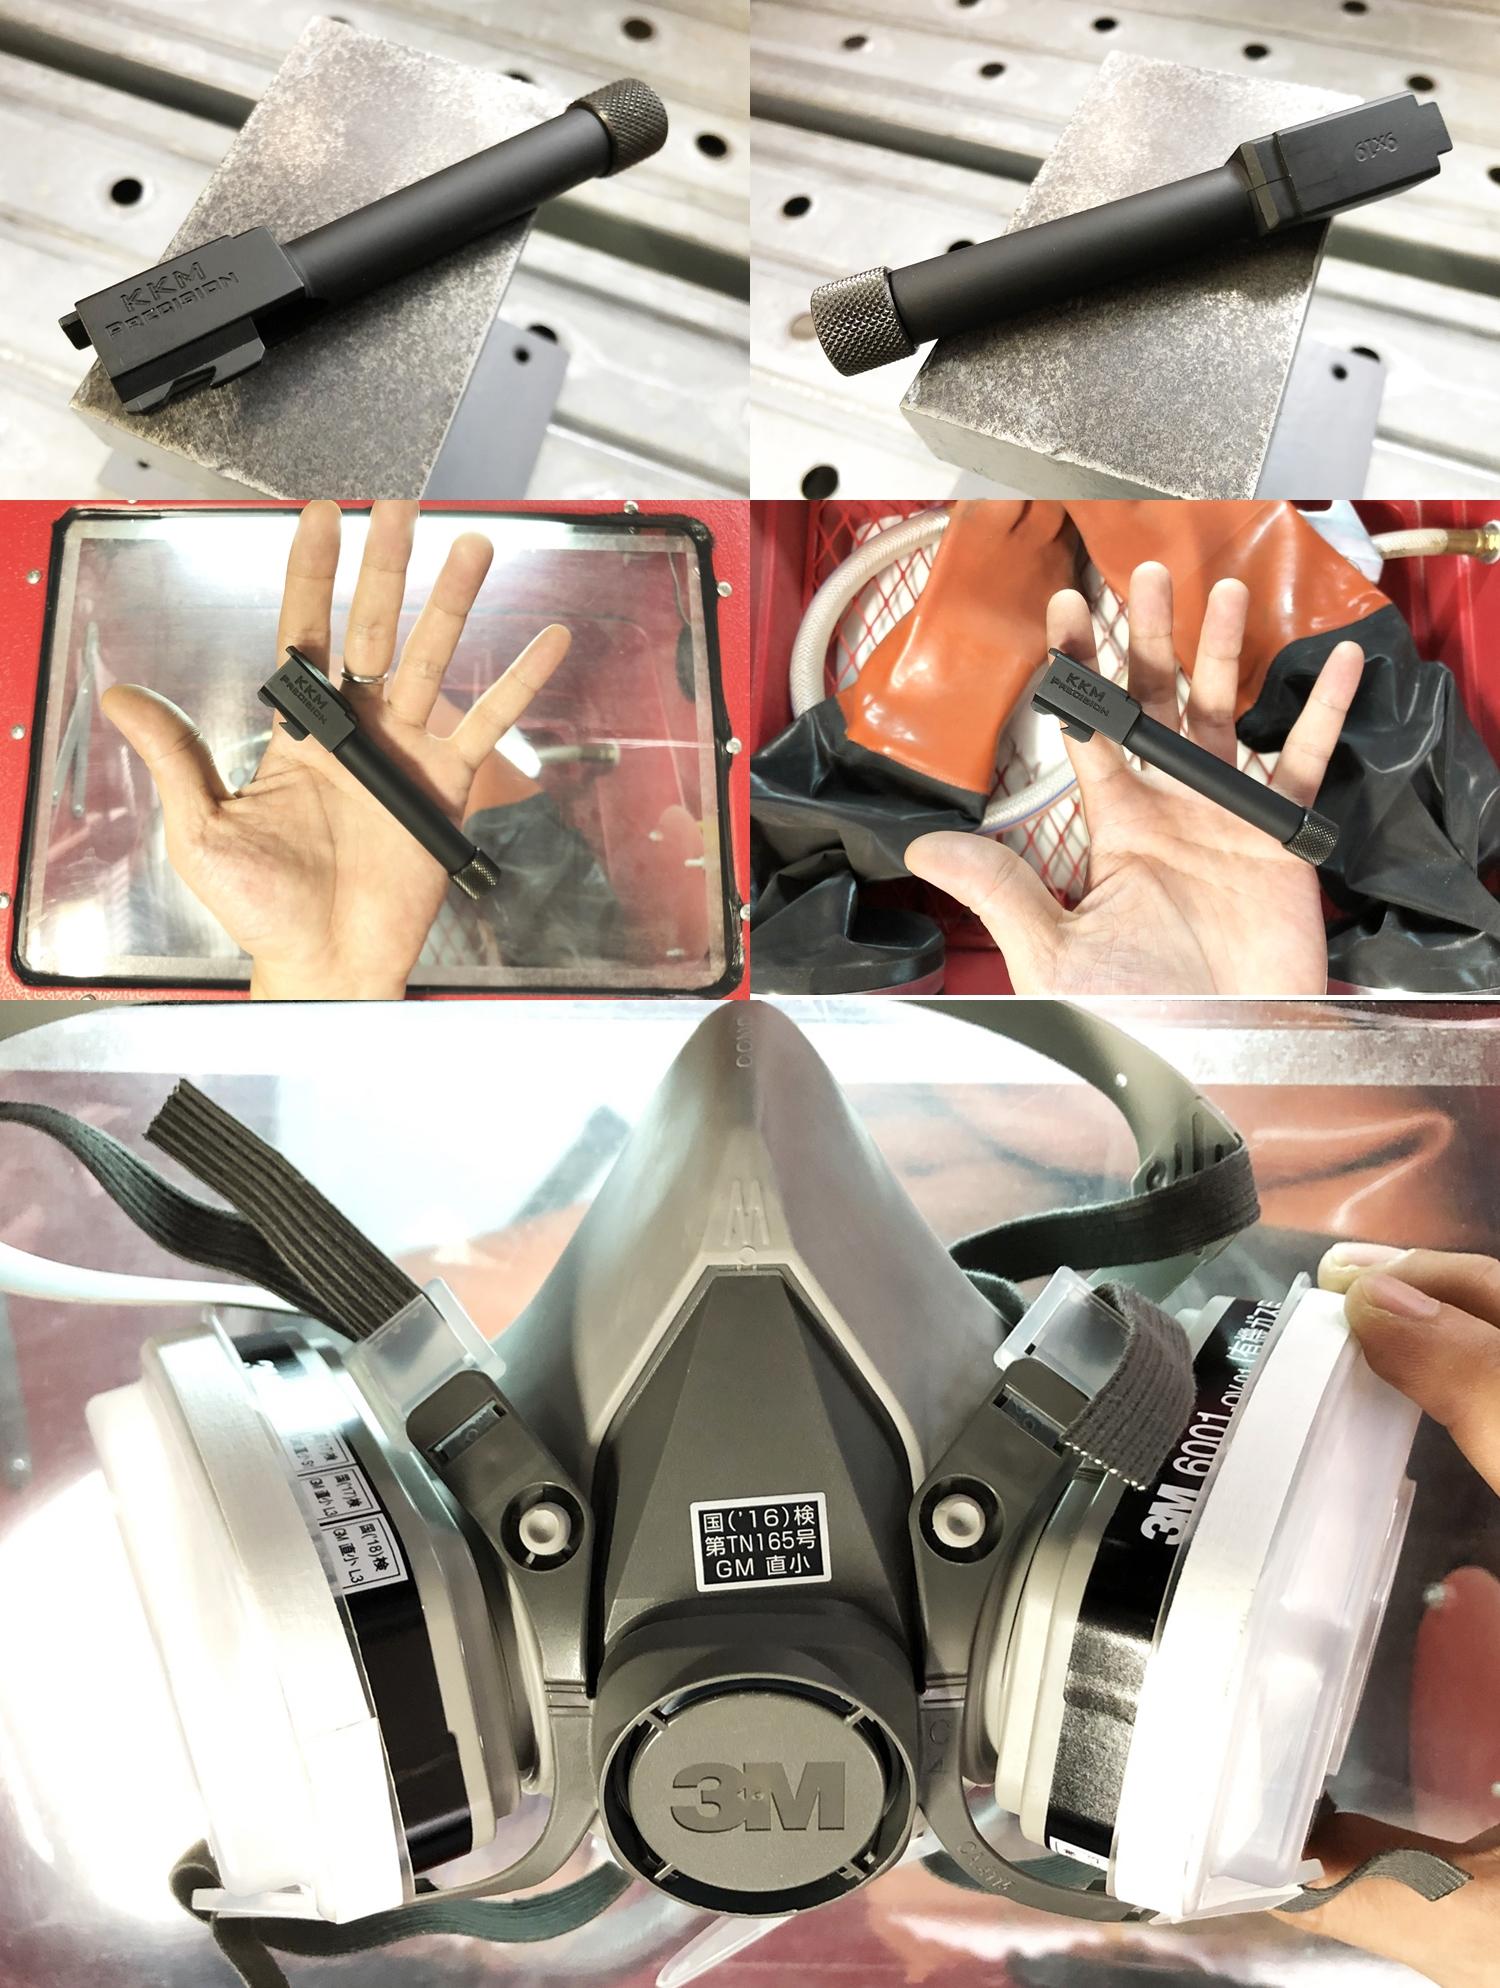 3 KKM MATCH BARREL + PROTECTOR KJ WORKS G19 TYPE & COMPENSATOR β-VERSION HILOG ORIGINAL 3D MOCKUP!! 『SUPDEFG19』自力で作るぞ大作戦!! 最も重要なアウターバレル&コンペンセイターの準備は整った!! DIY サン